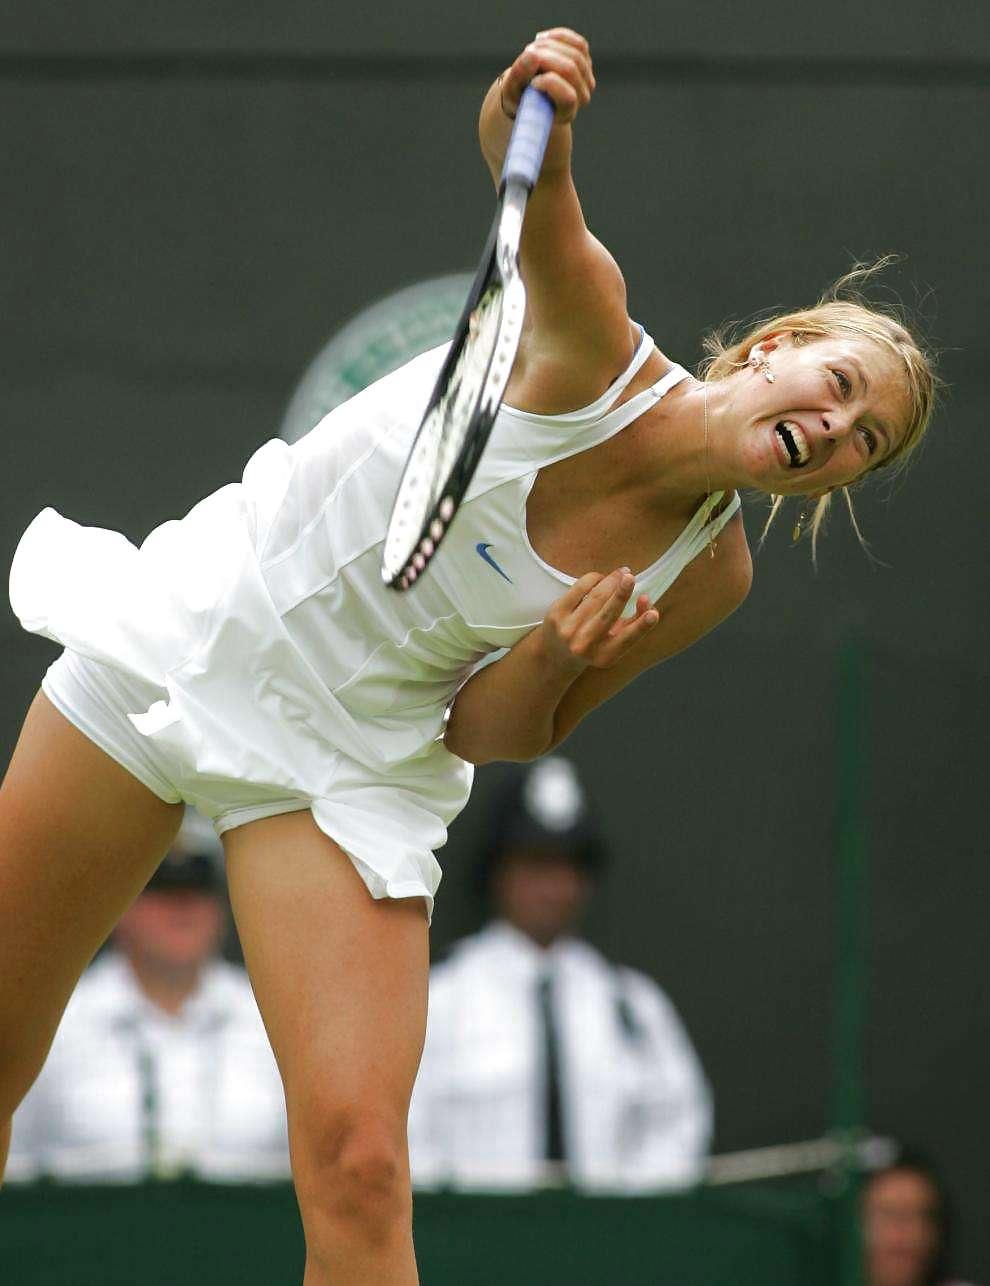 Maria Sharapova Hottest Pics